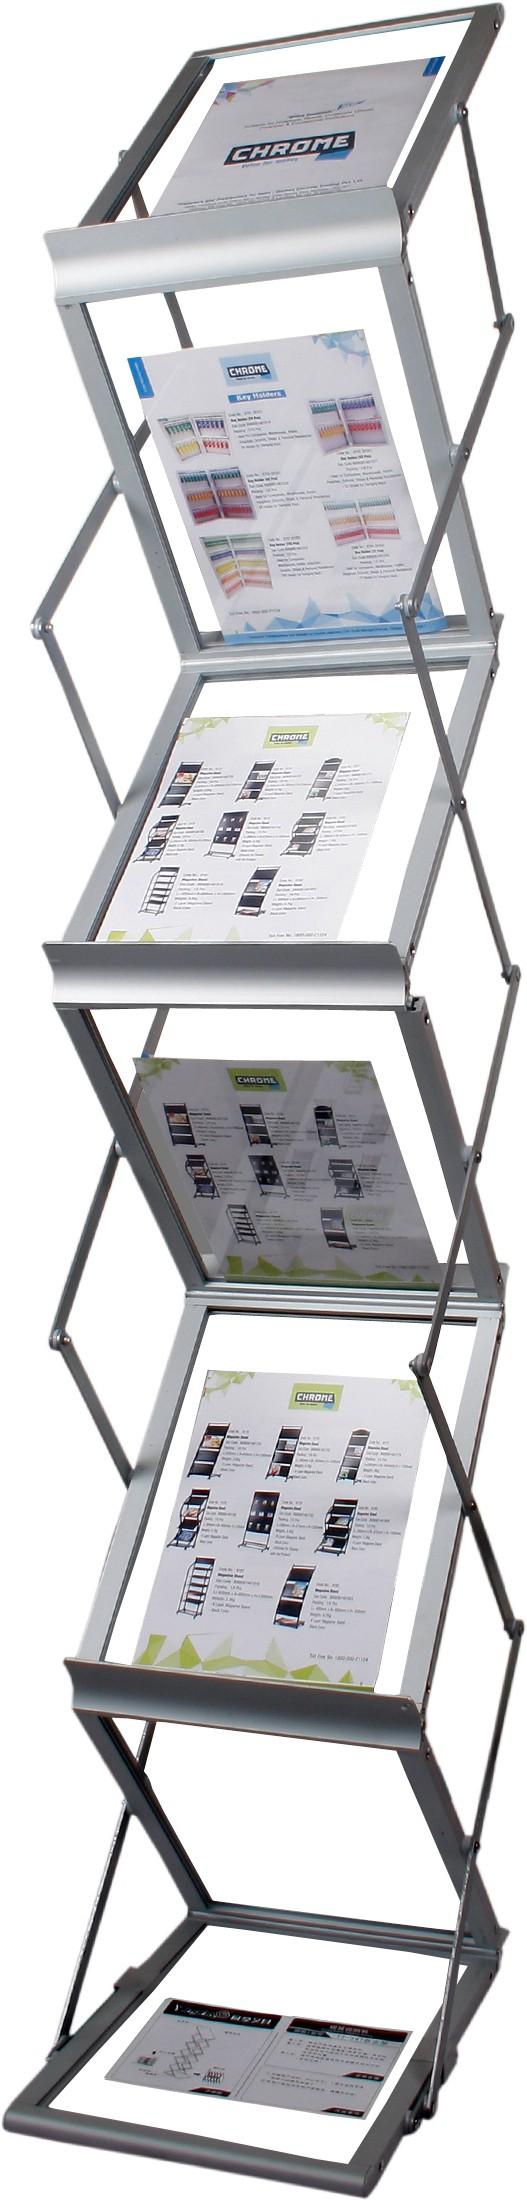 View Chrome 2361 Floor Standing Magazine Holder(Grey, Iron) Furniture (Chrome)